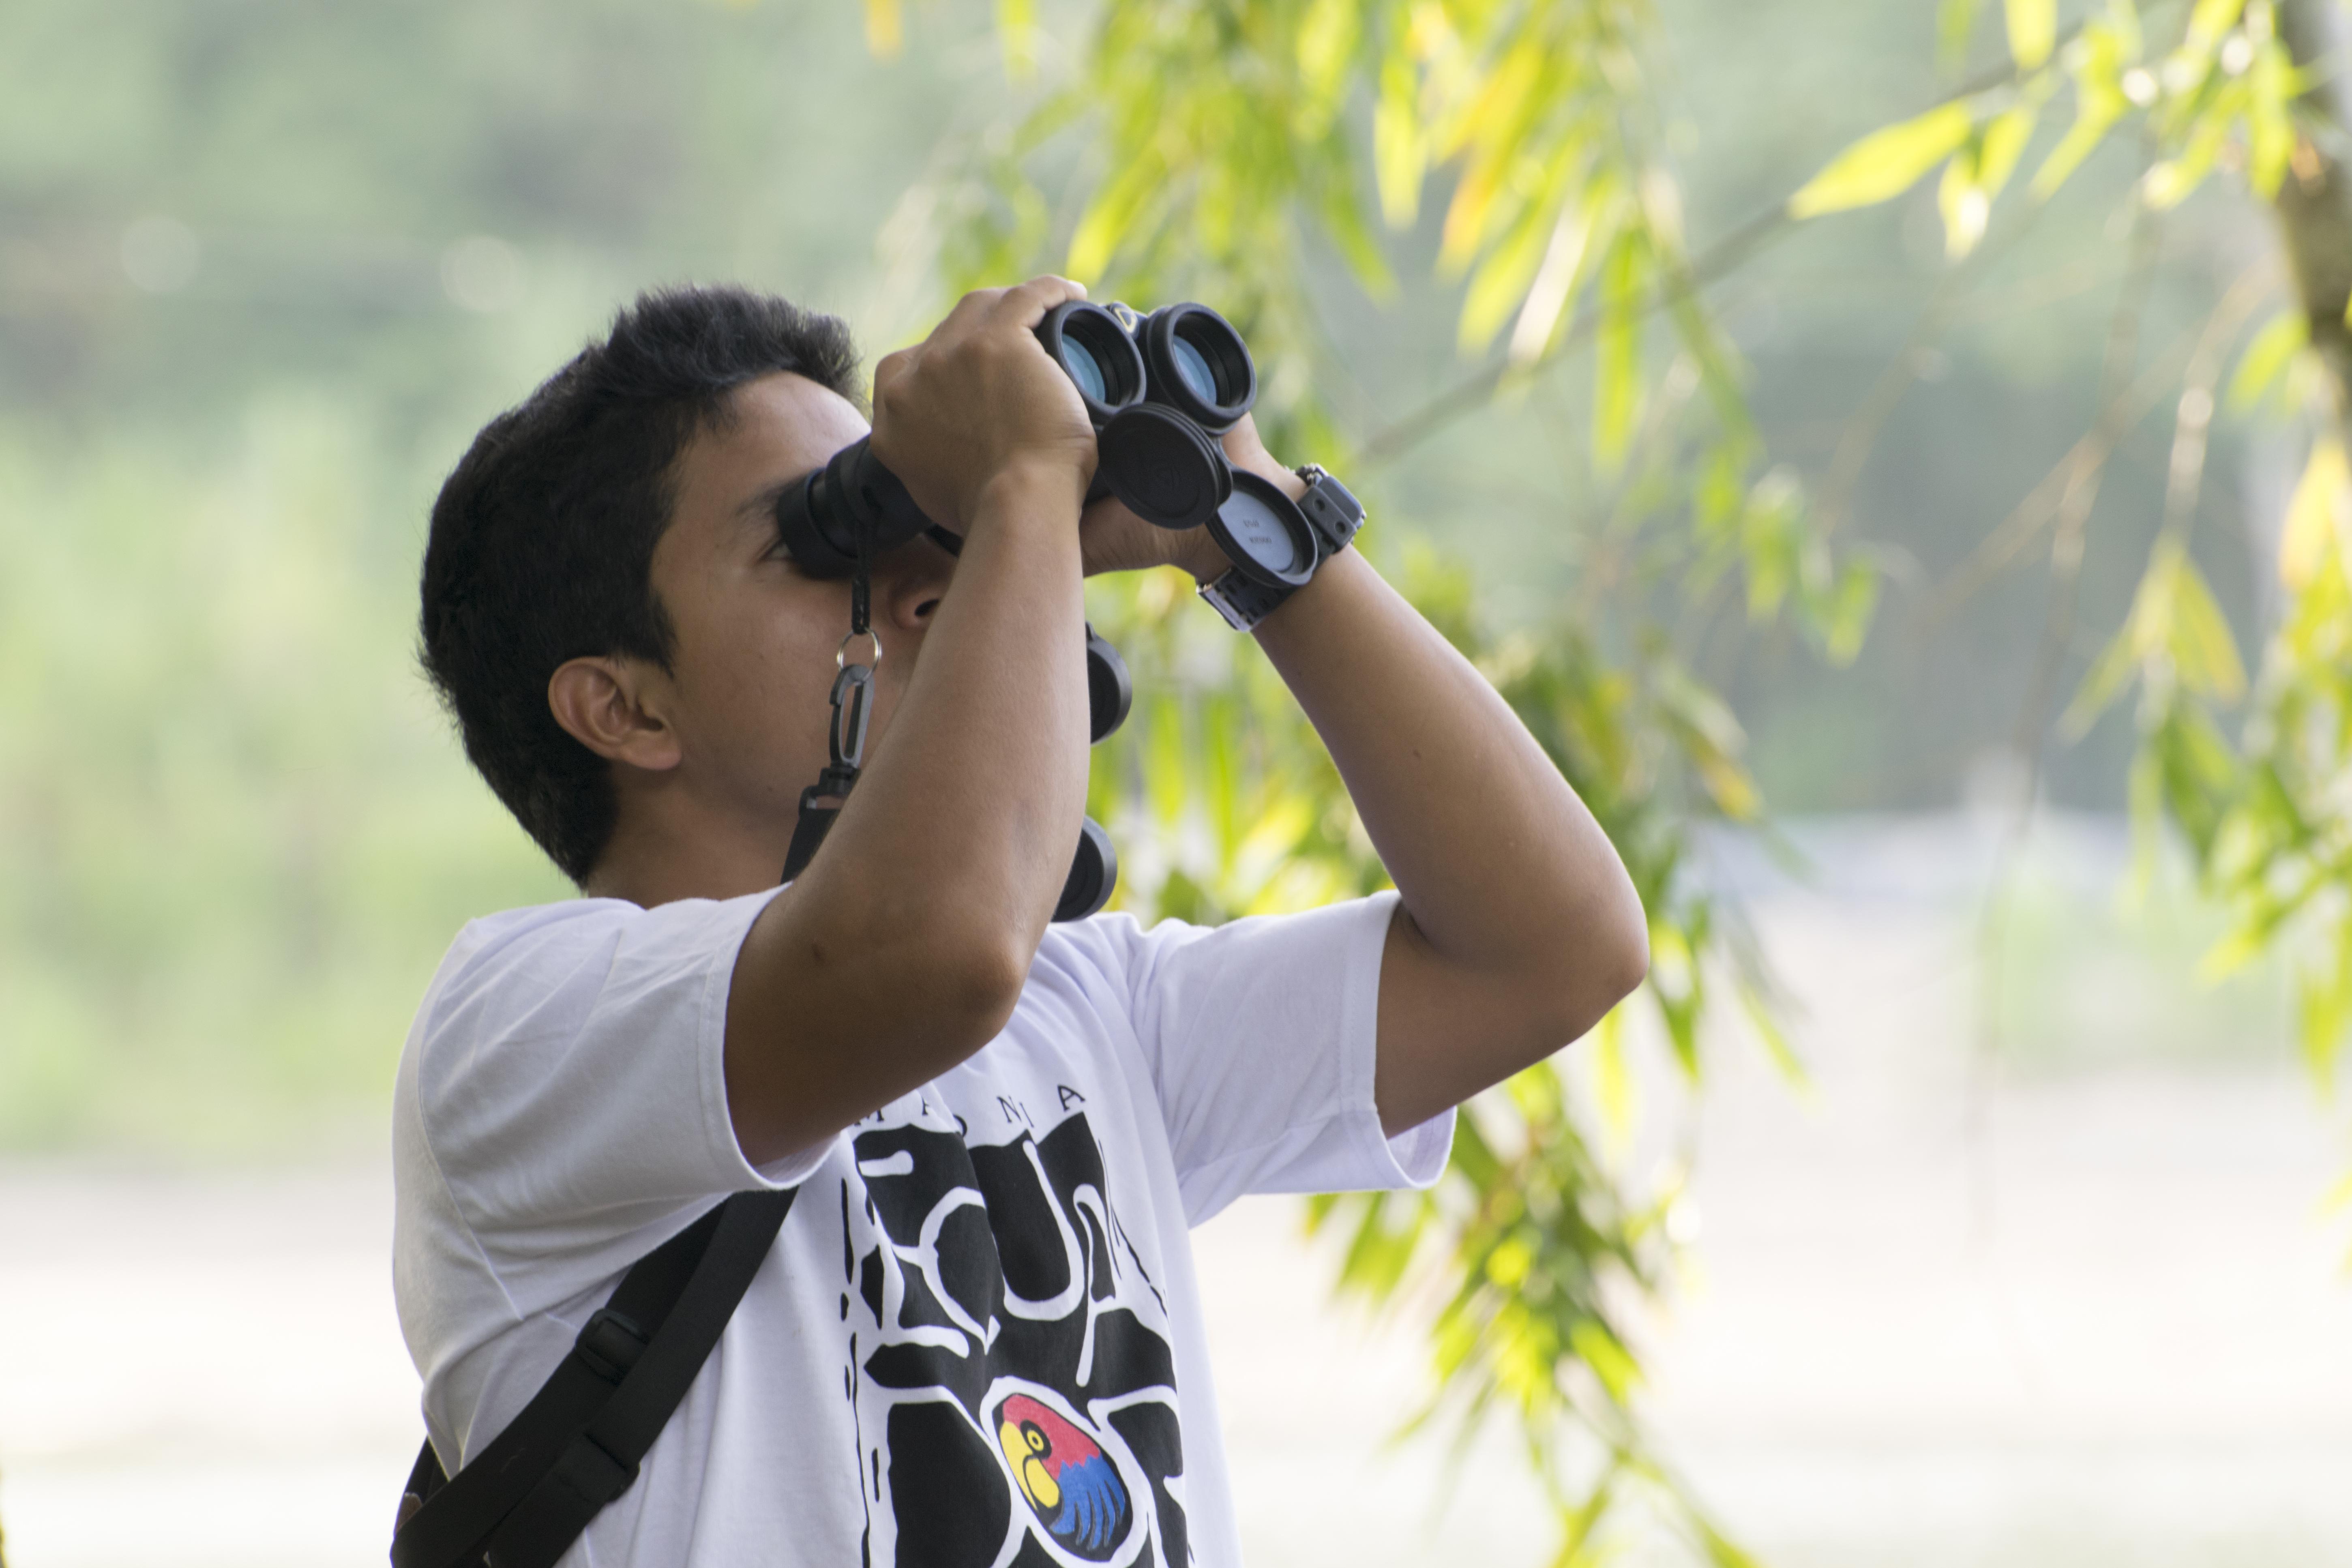 Copy of binoculars